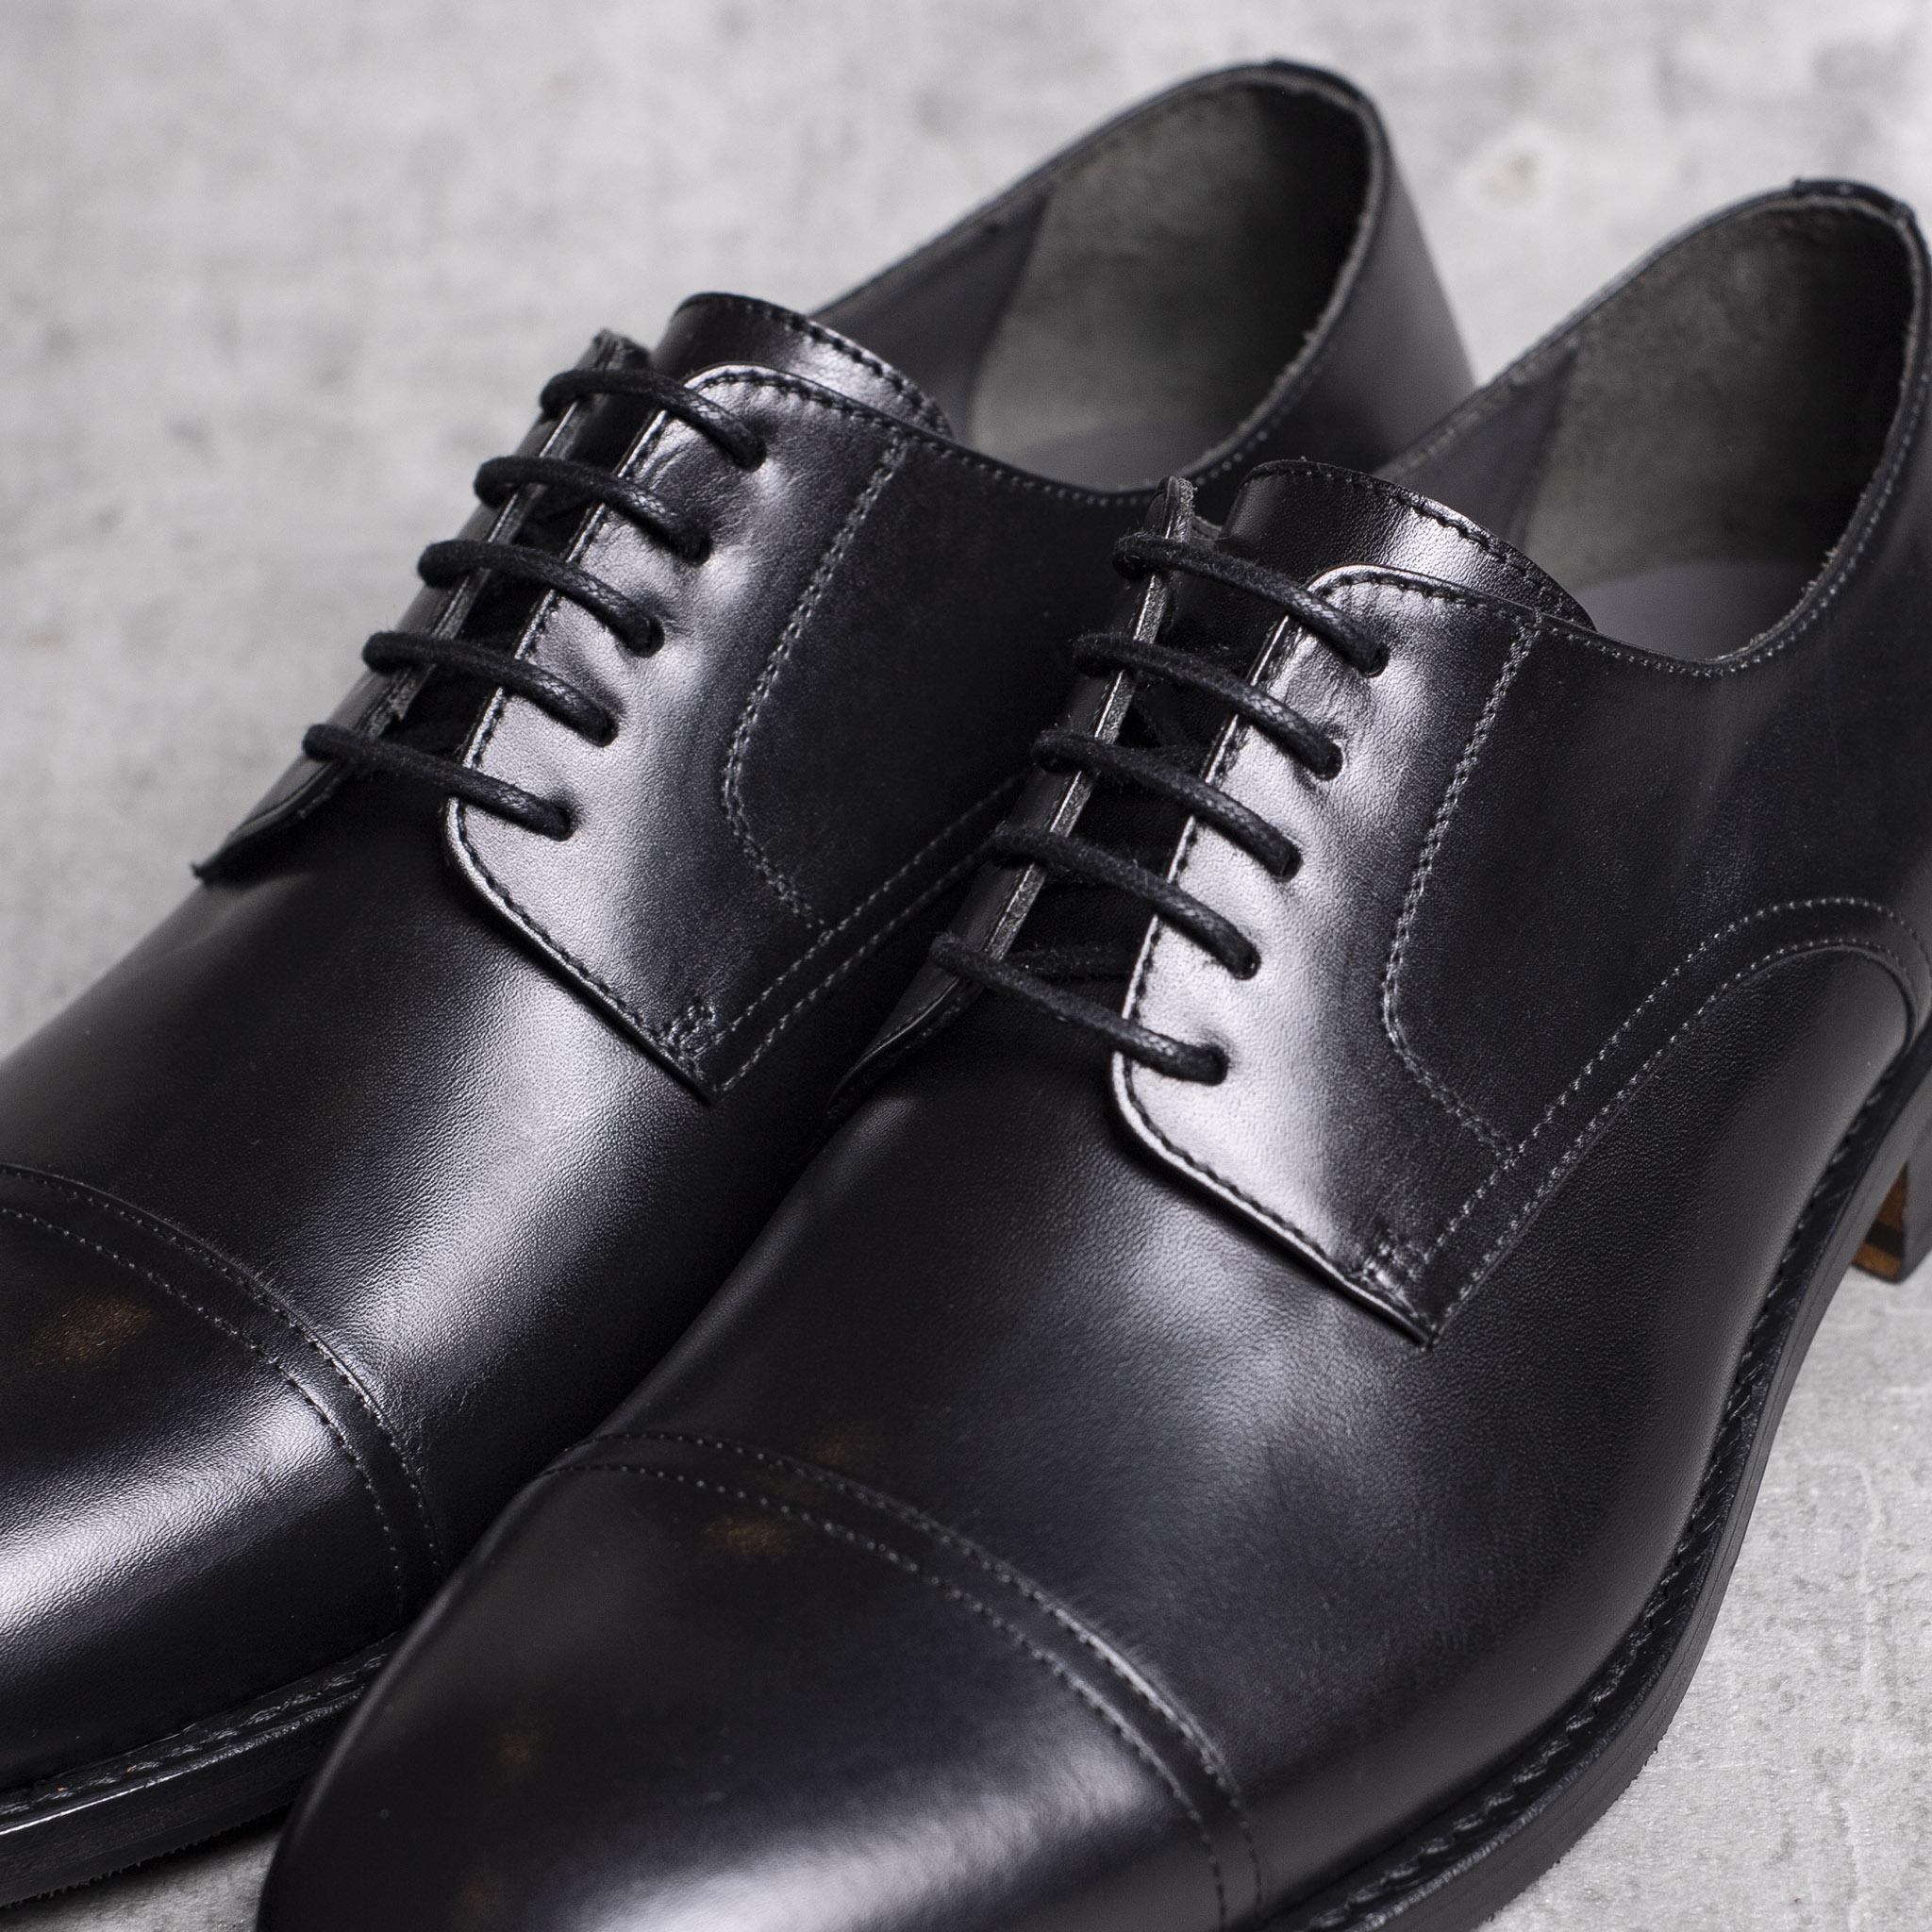 DERBY · 0649 Black leather The Seëlk 5